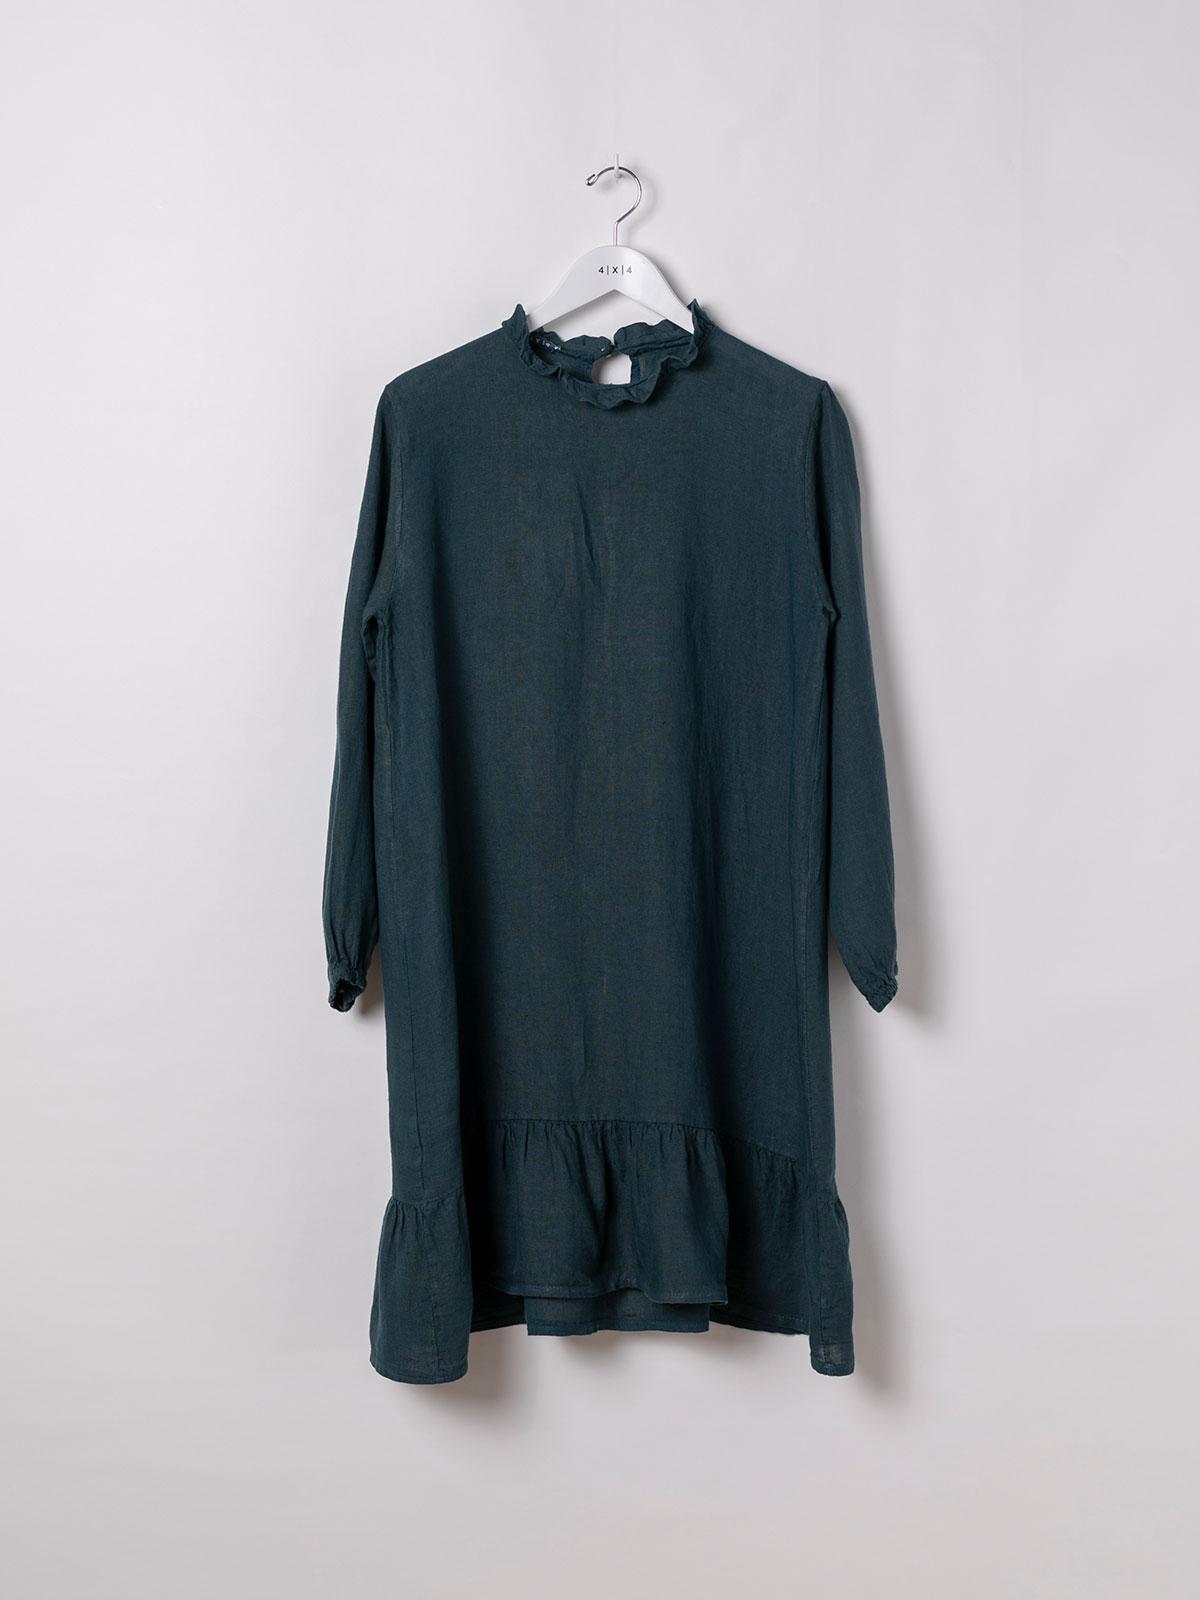 Vestido lino manga larga detalle azul oscuro